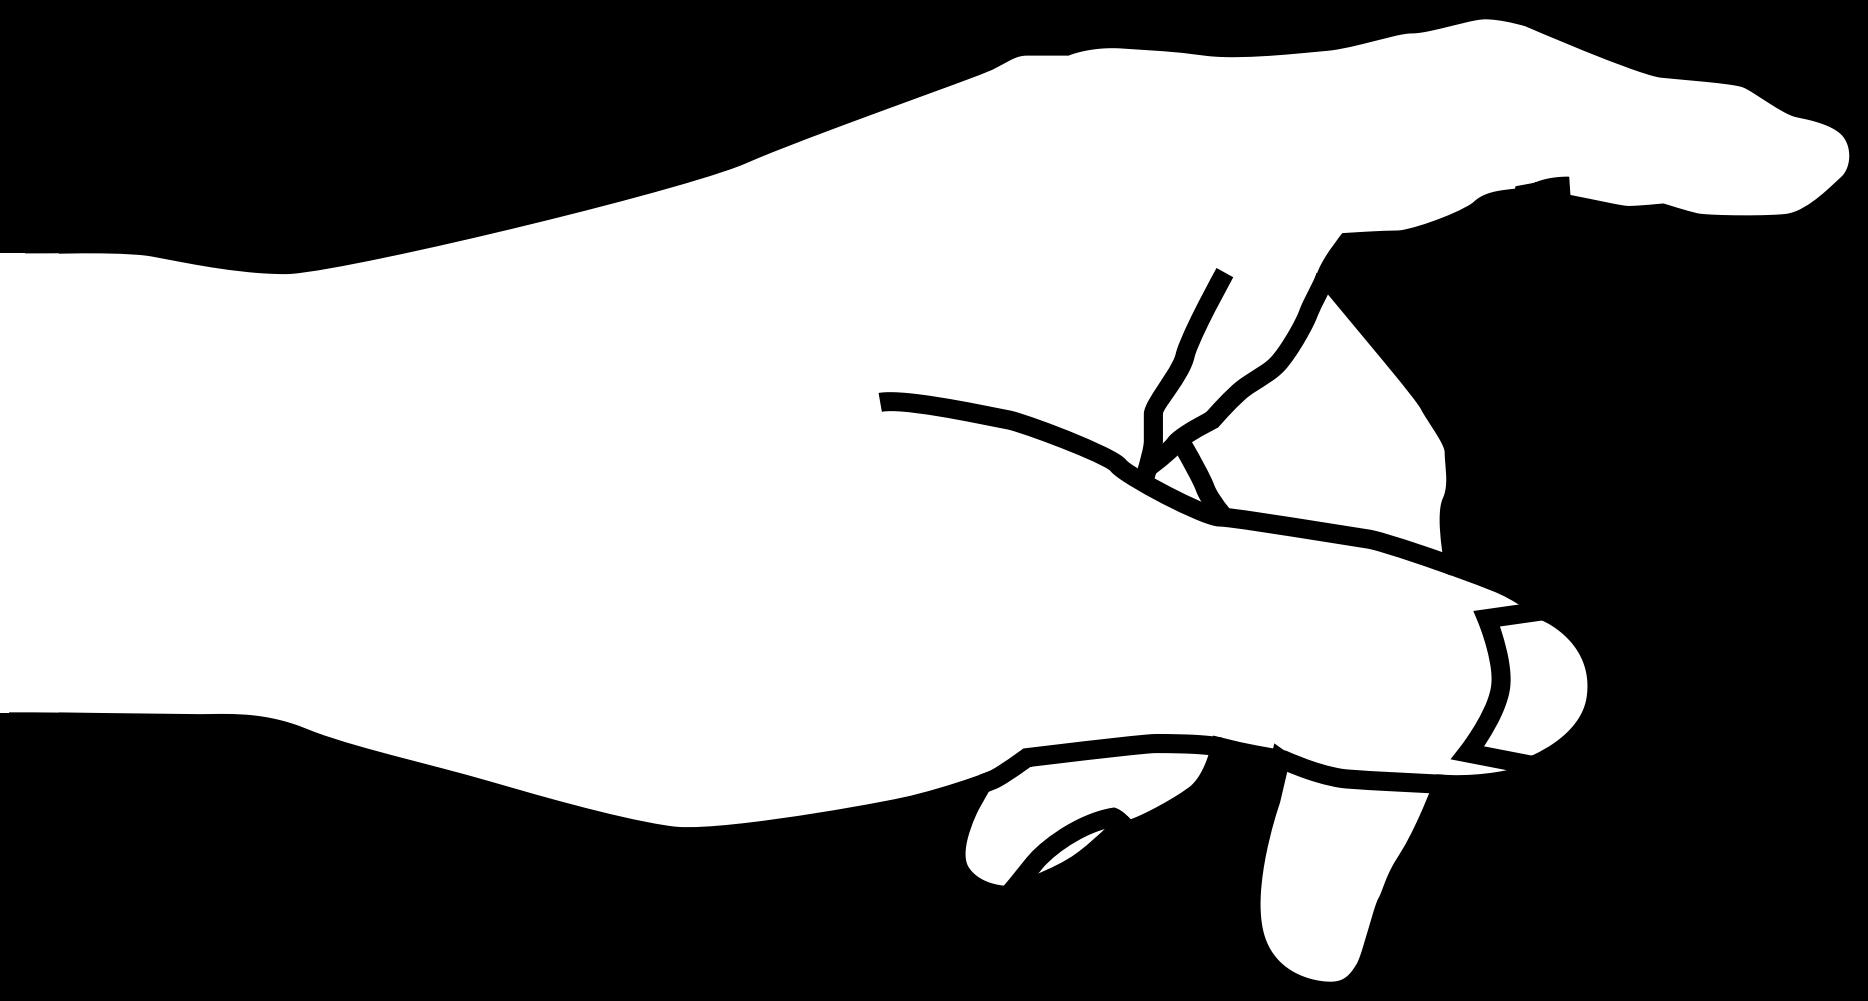 Handprint clipart printable. Finger hand outline pencil